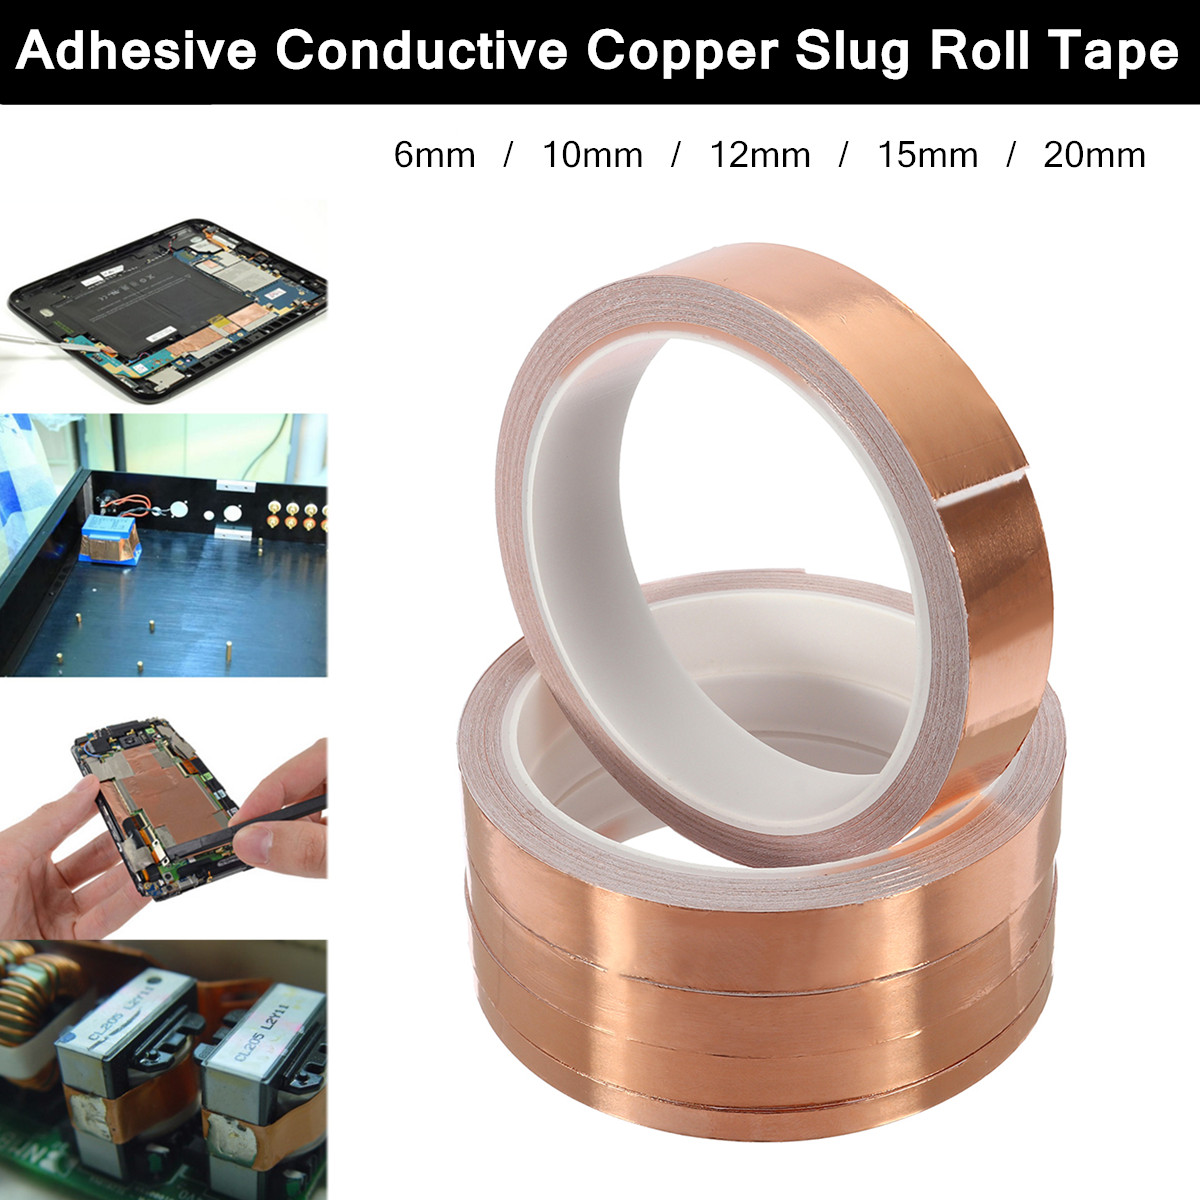 10m 6mm/10mm/12mm/15mm/20mm Single-sided Adhesive Conductive Copper Foil Tape Guitar Pickup EMI Shield Eliminate EMI Anti-static запчасти для автоматических столов emi